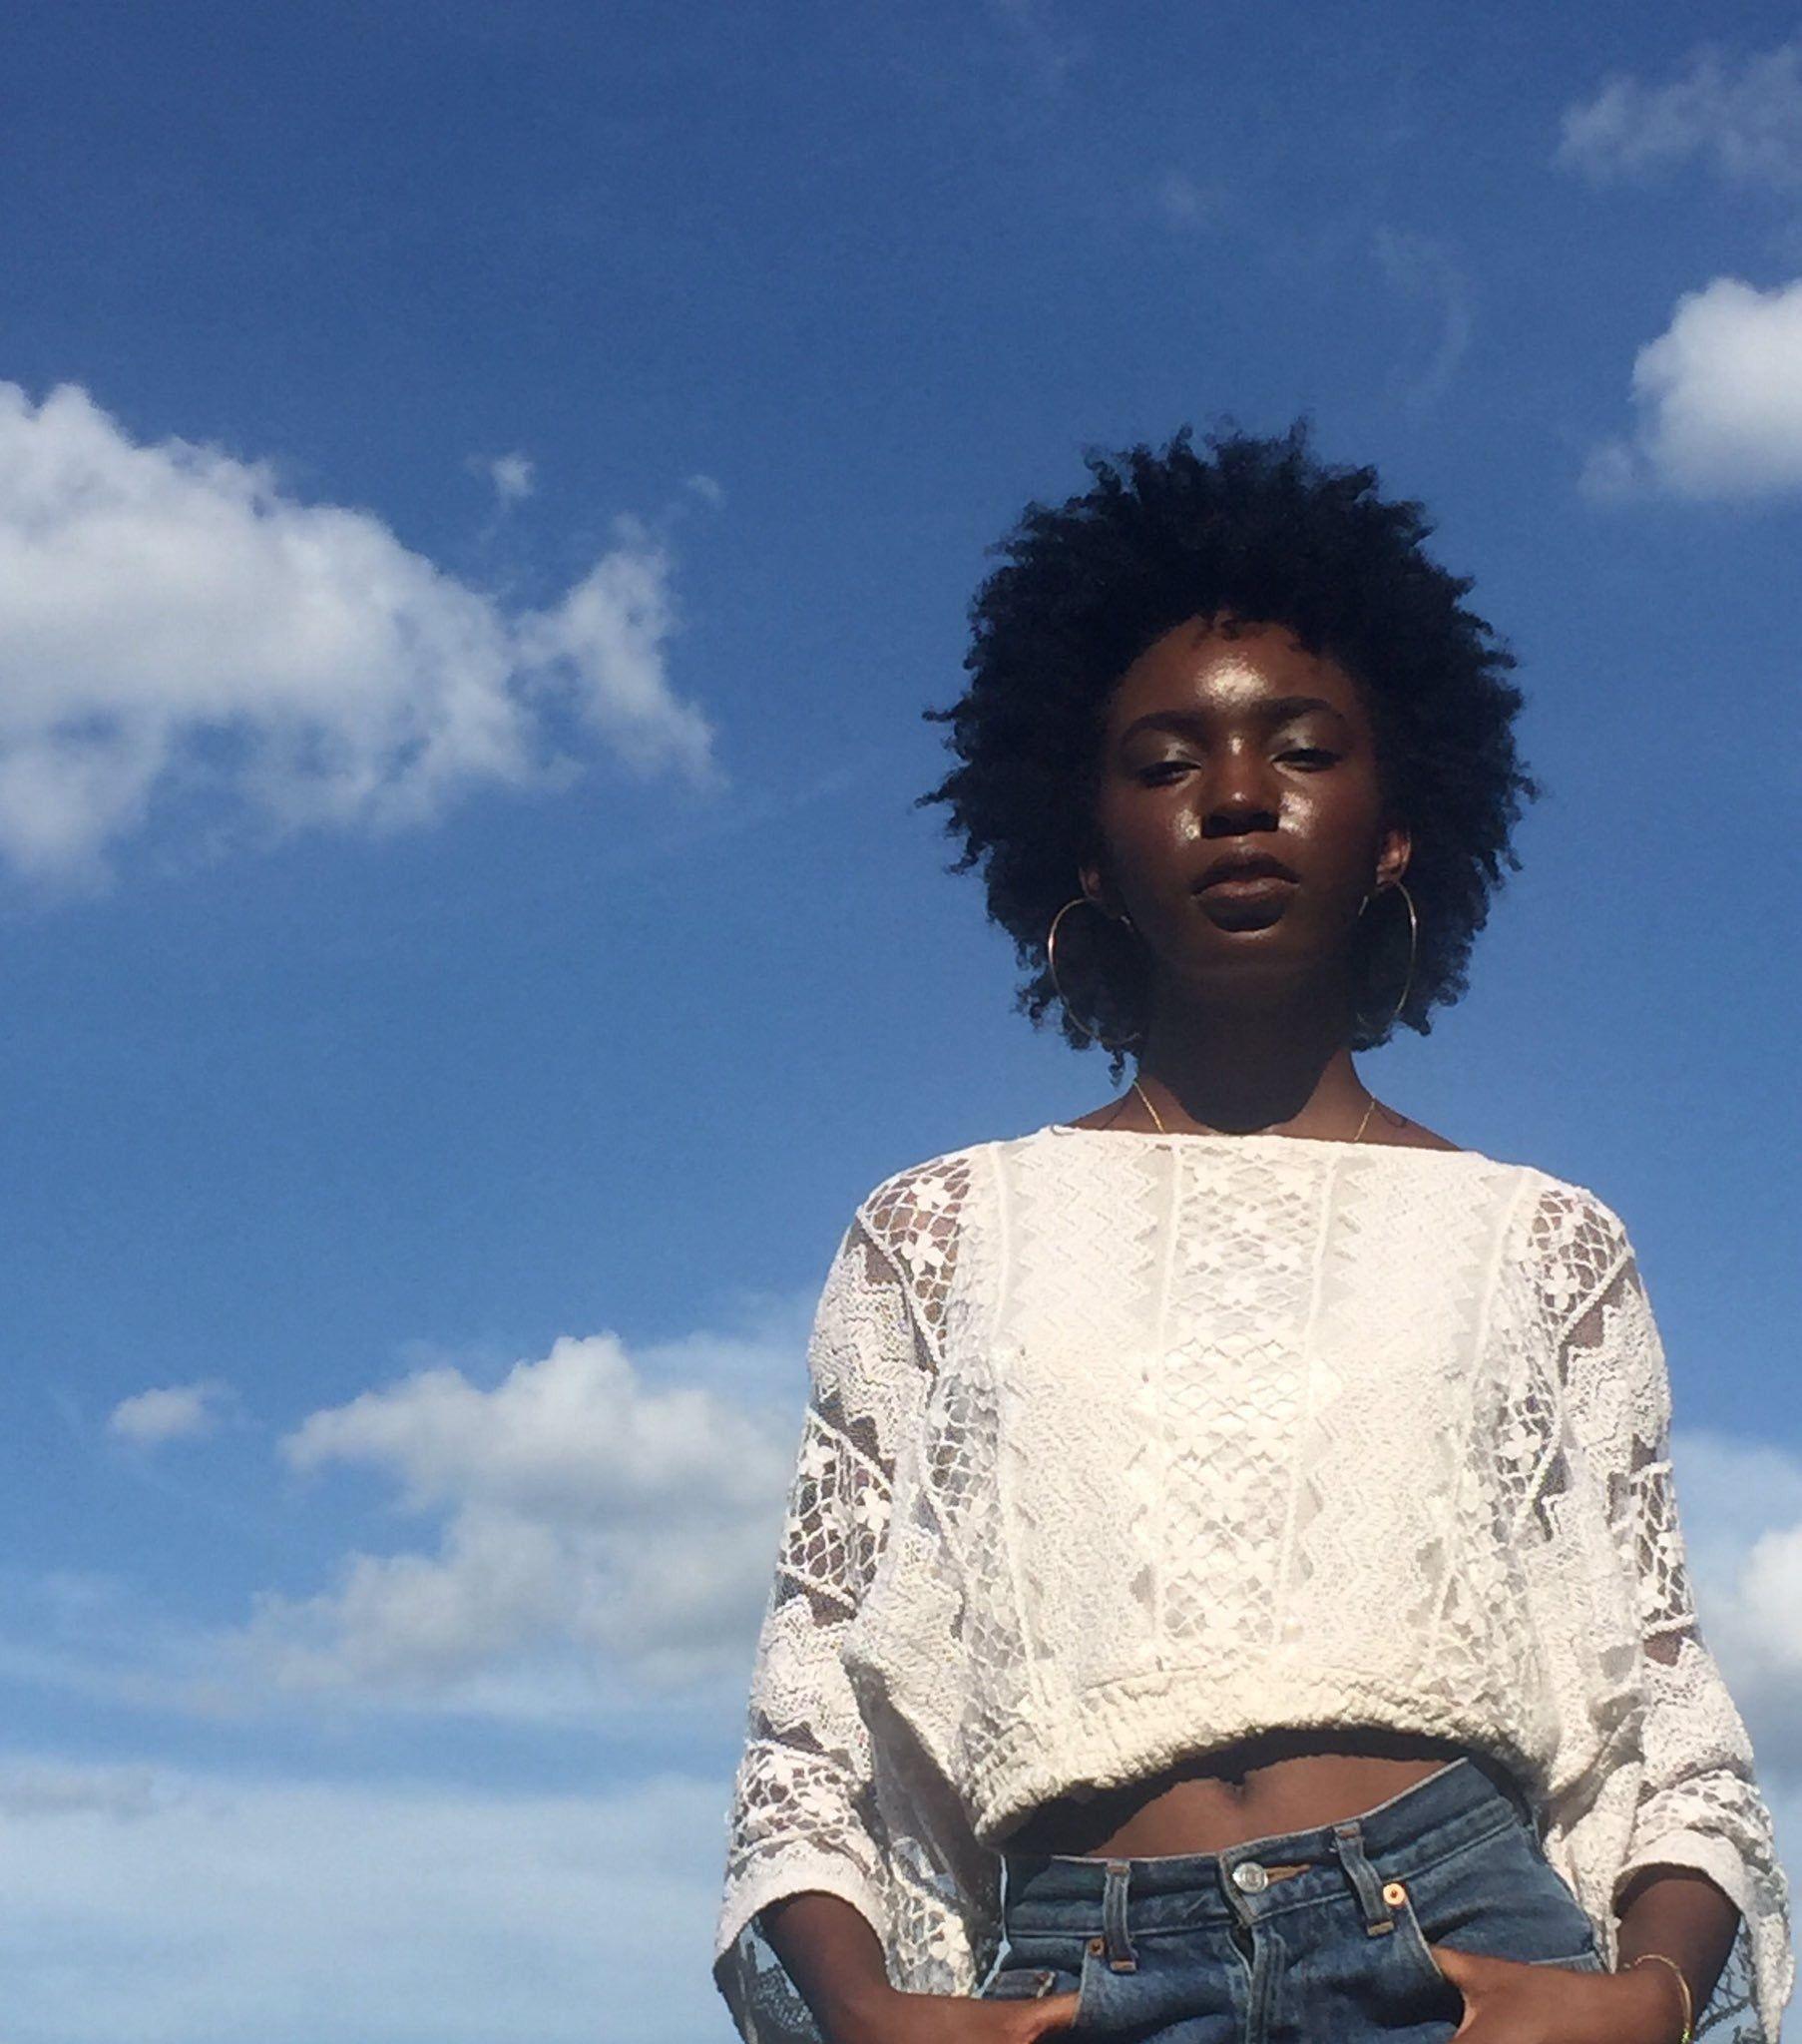 Pin by martina kilroy on dark skin pinterest black girl magic